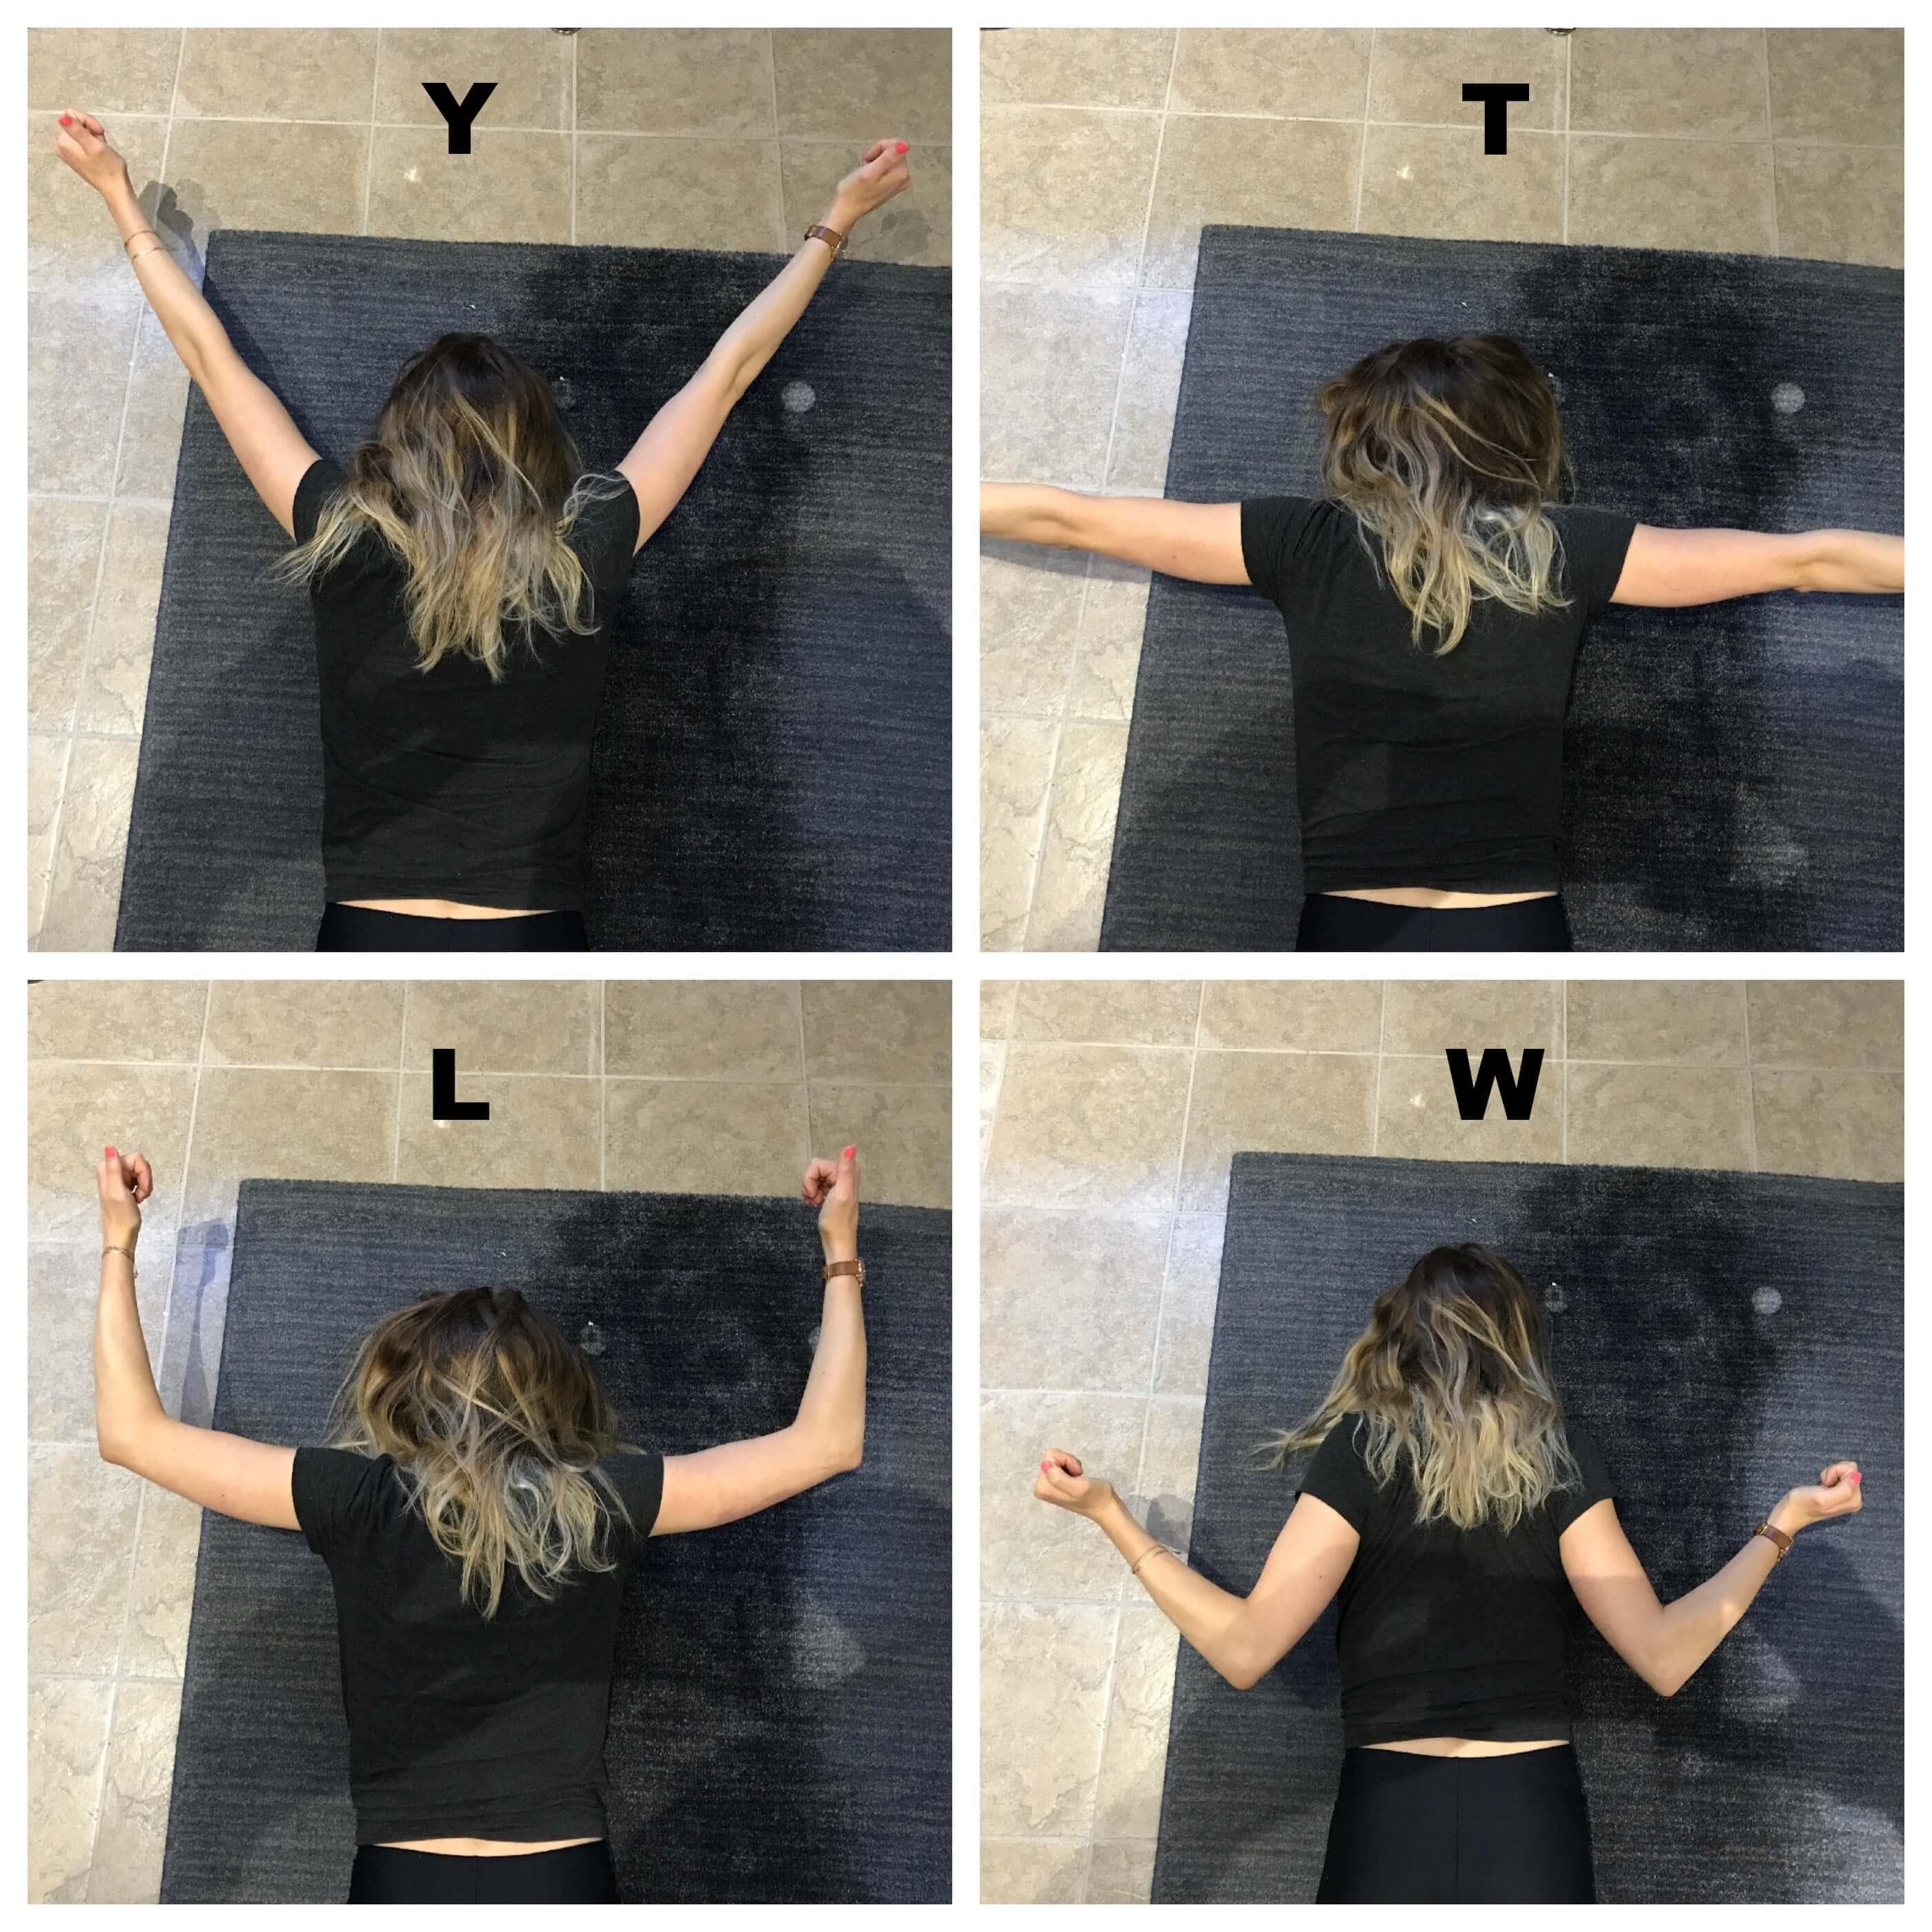 Douleur intercostale exercice YTLW